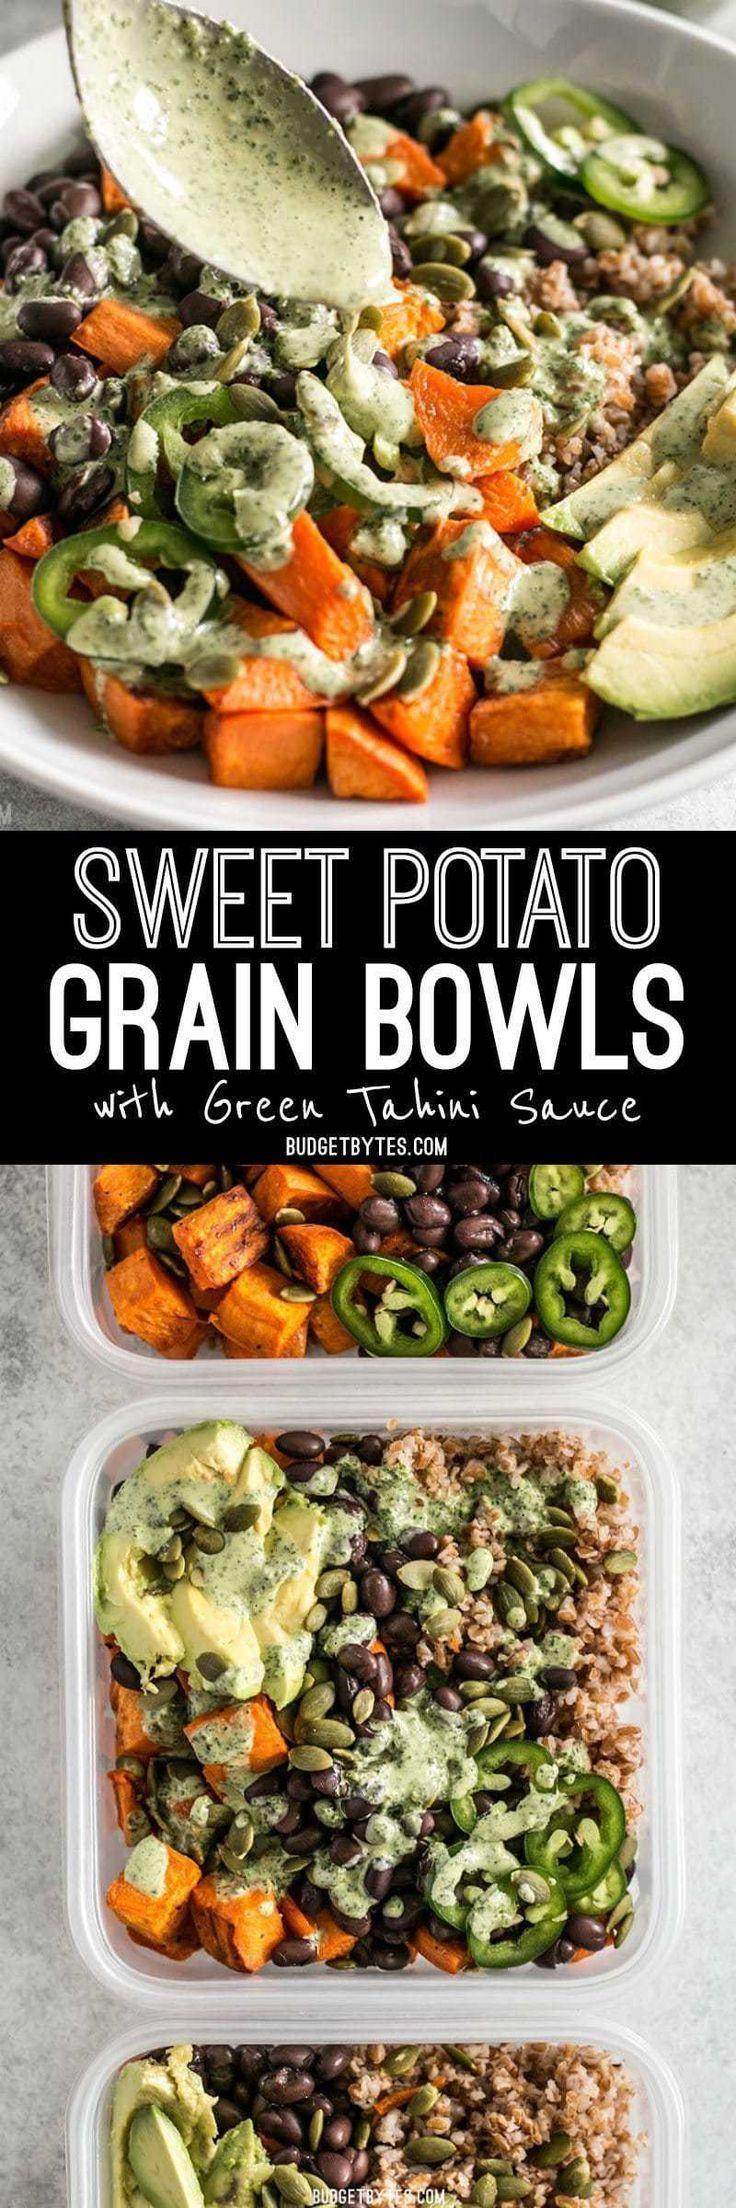 with Green Tahini Sauce   Sweet Potato Grain Bowls with Green Tahini Sauce  Sweet Potato Grain Bowls with Green Tahini Sauce   Sweet Potato Grain Bowls with Green Tahini...